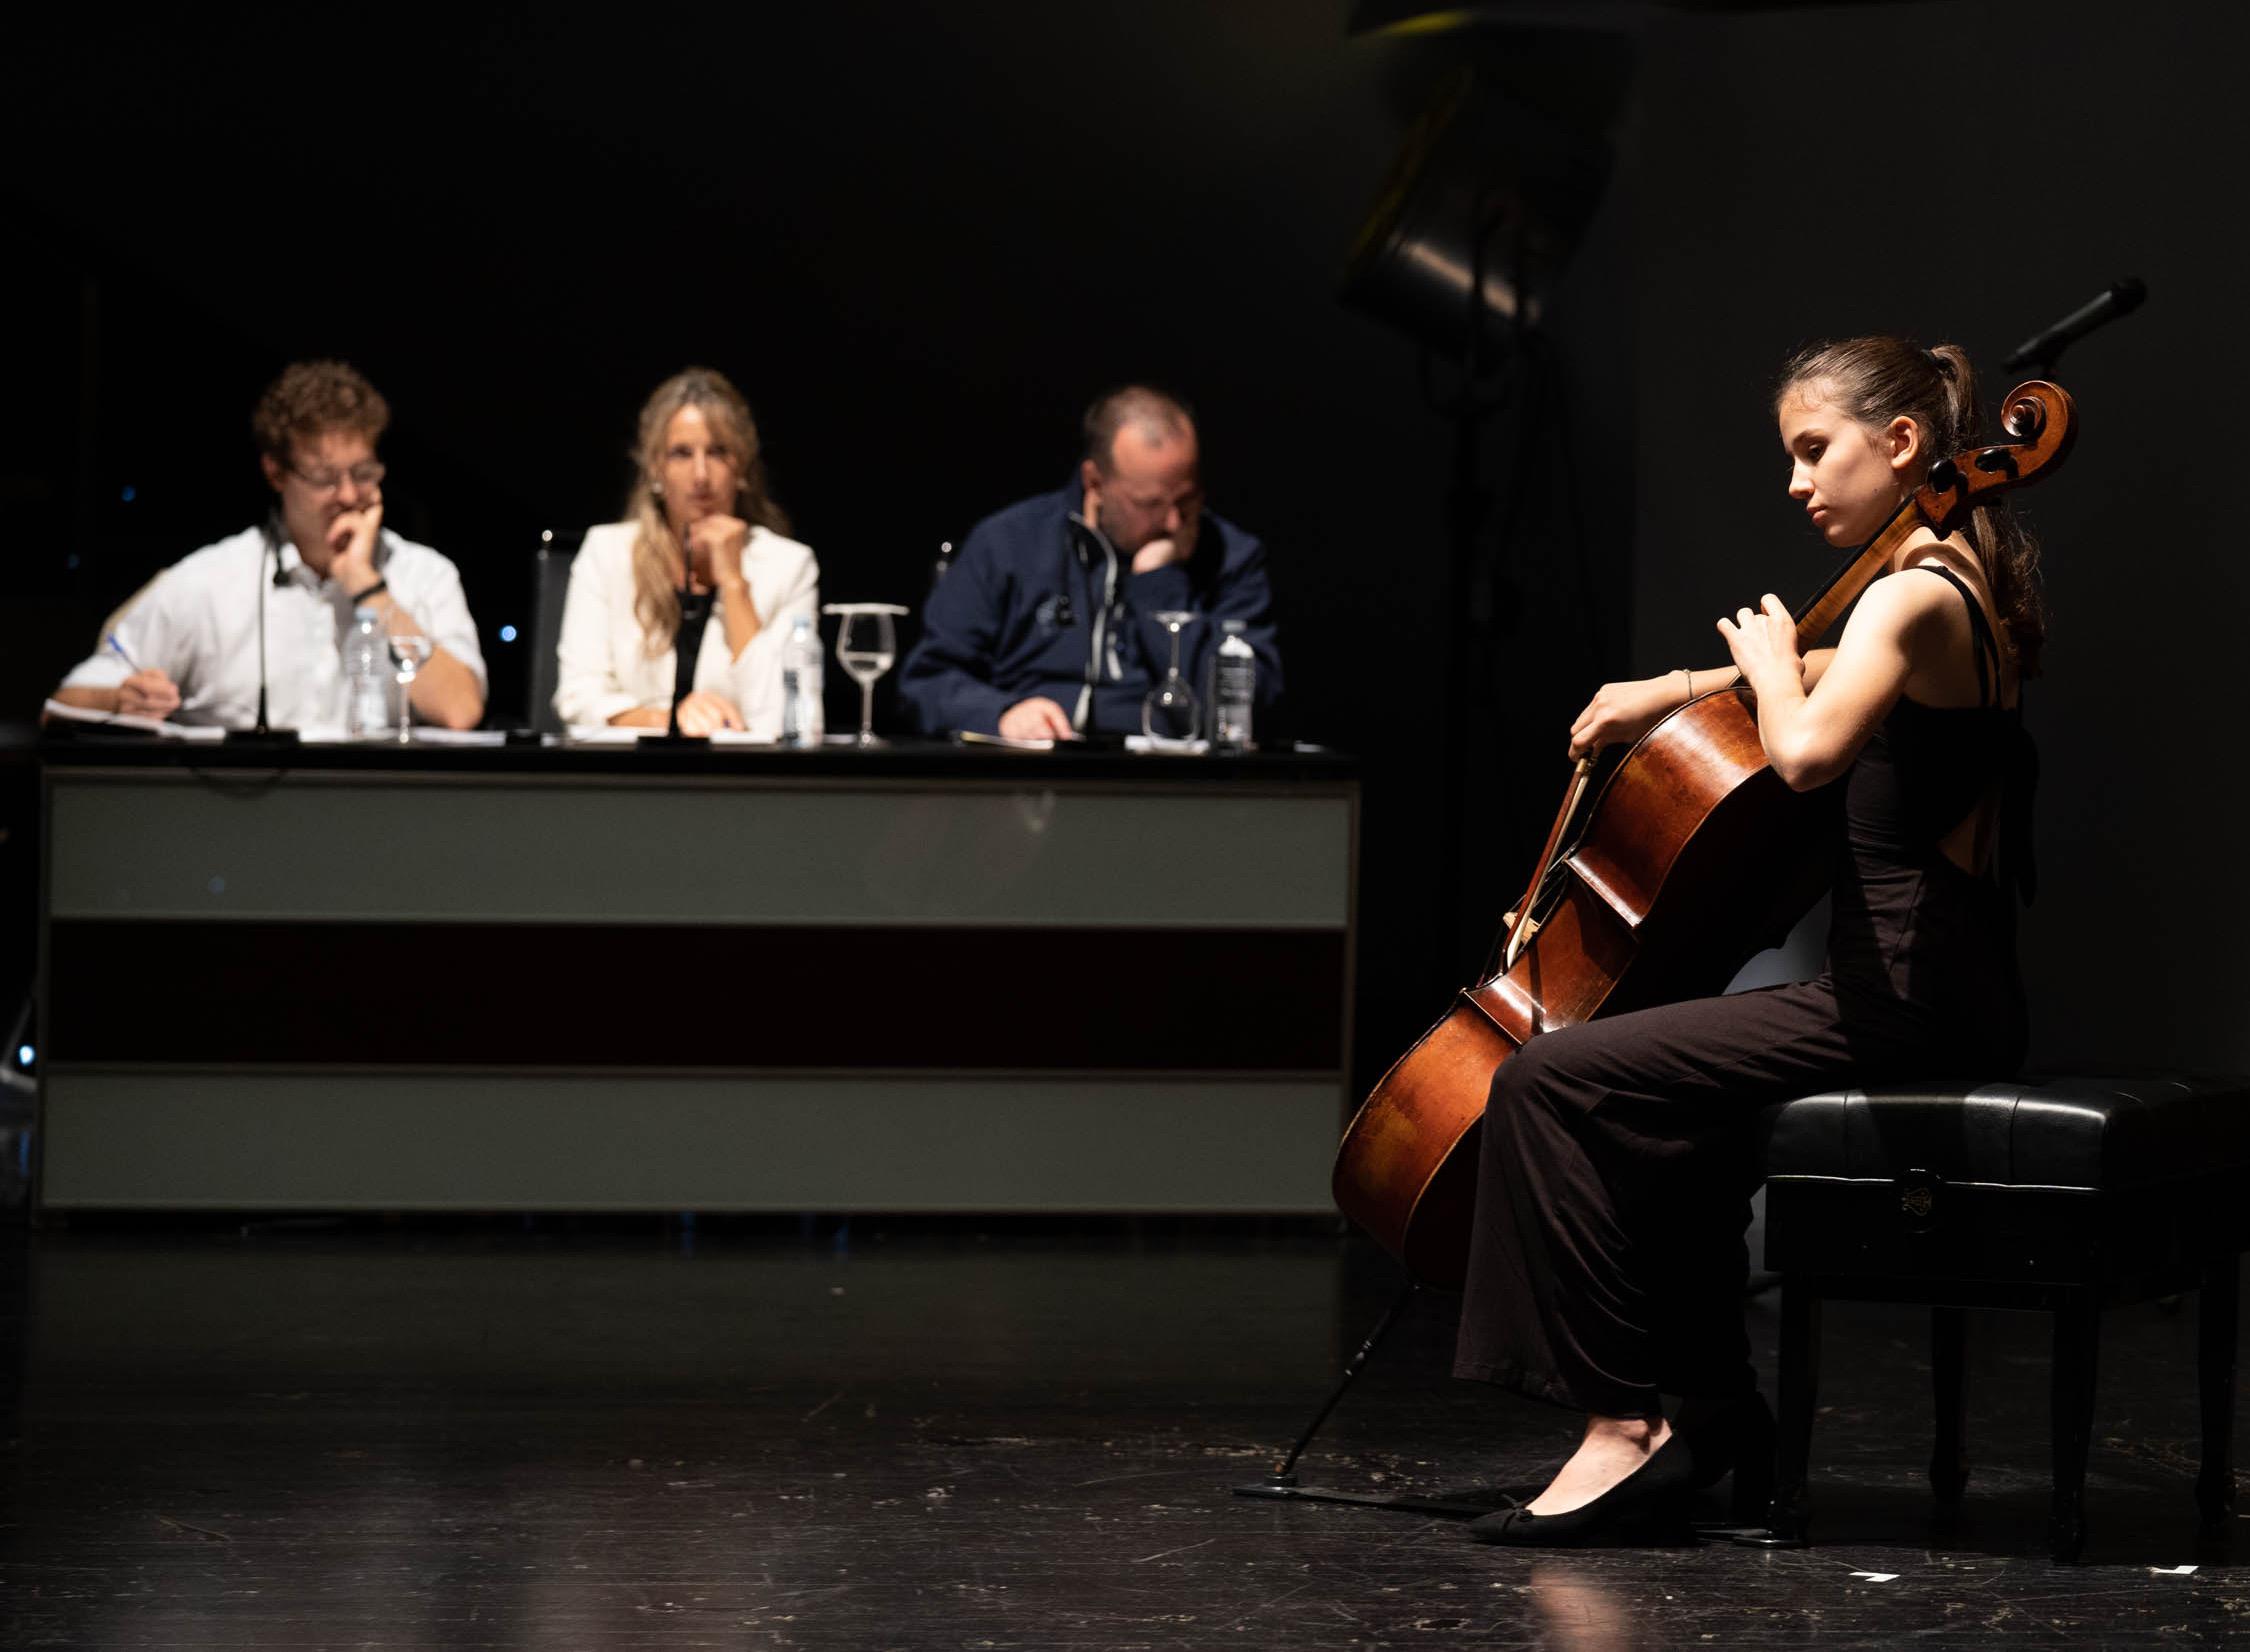 Auditorio de Tenerife recibe la fase autonómica del 19º Intercentros Melómano